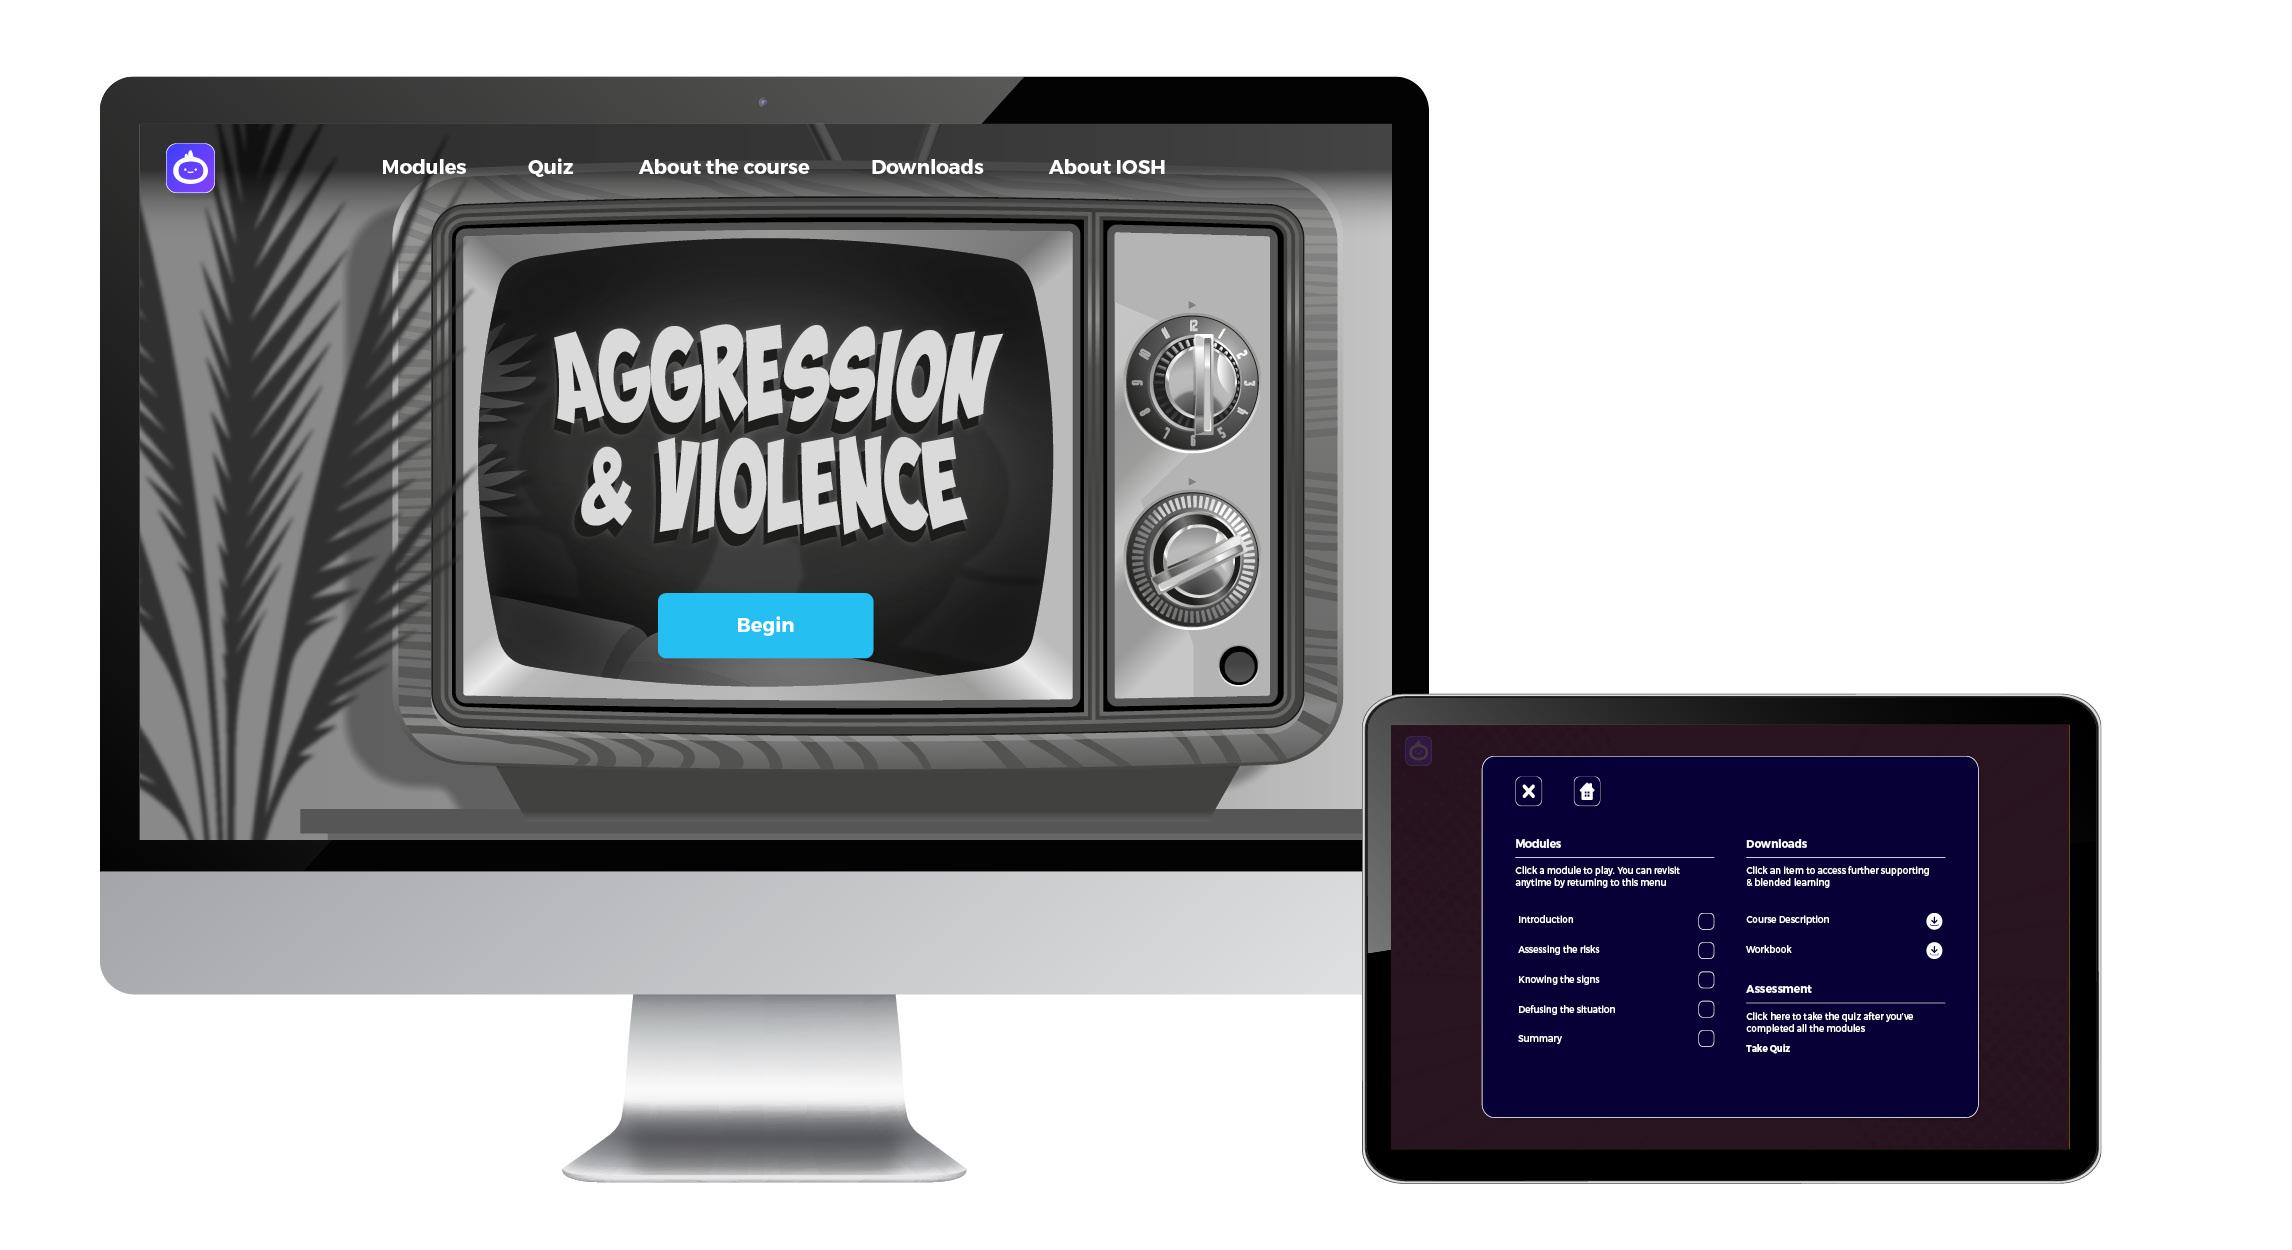 iAM 00025 - Aggression & Violence - Landing Page7